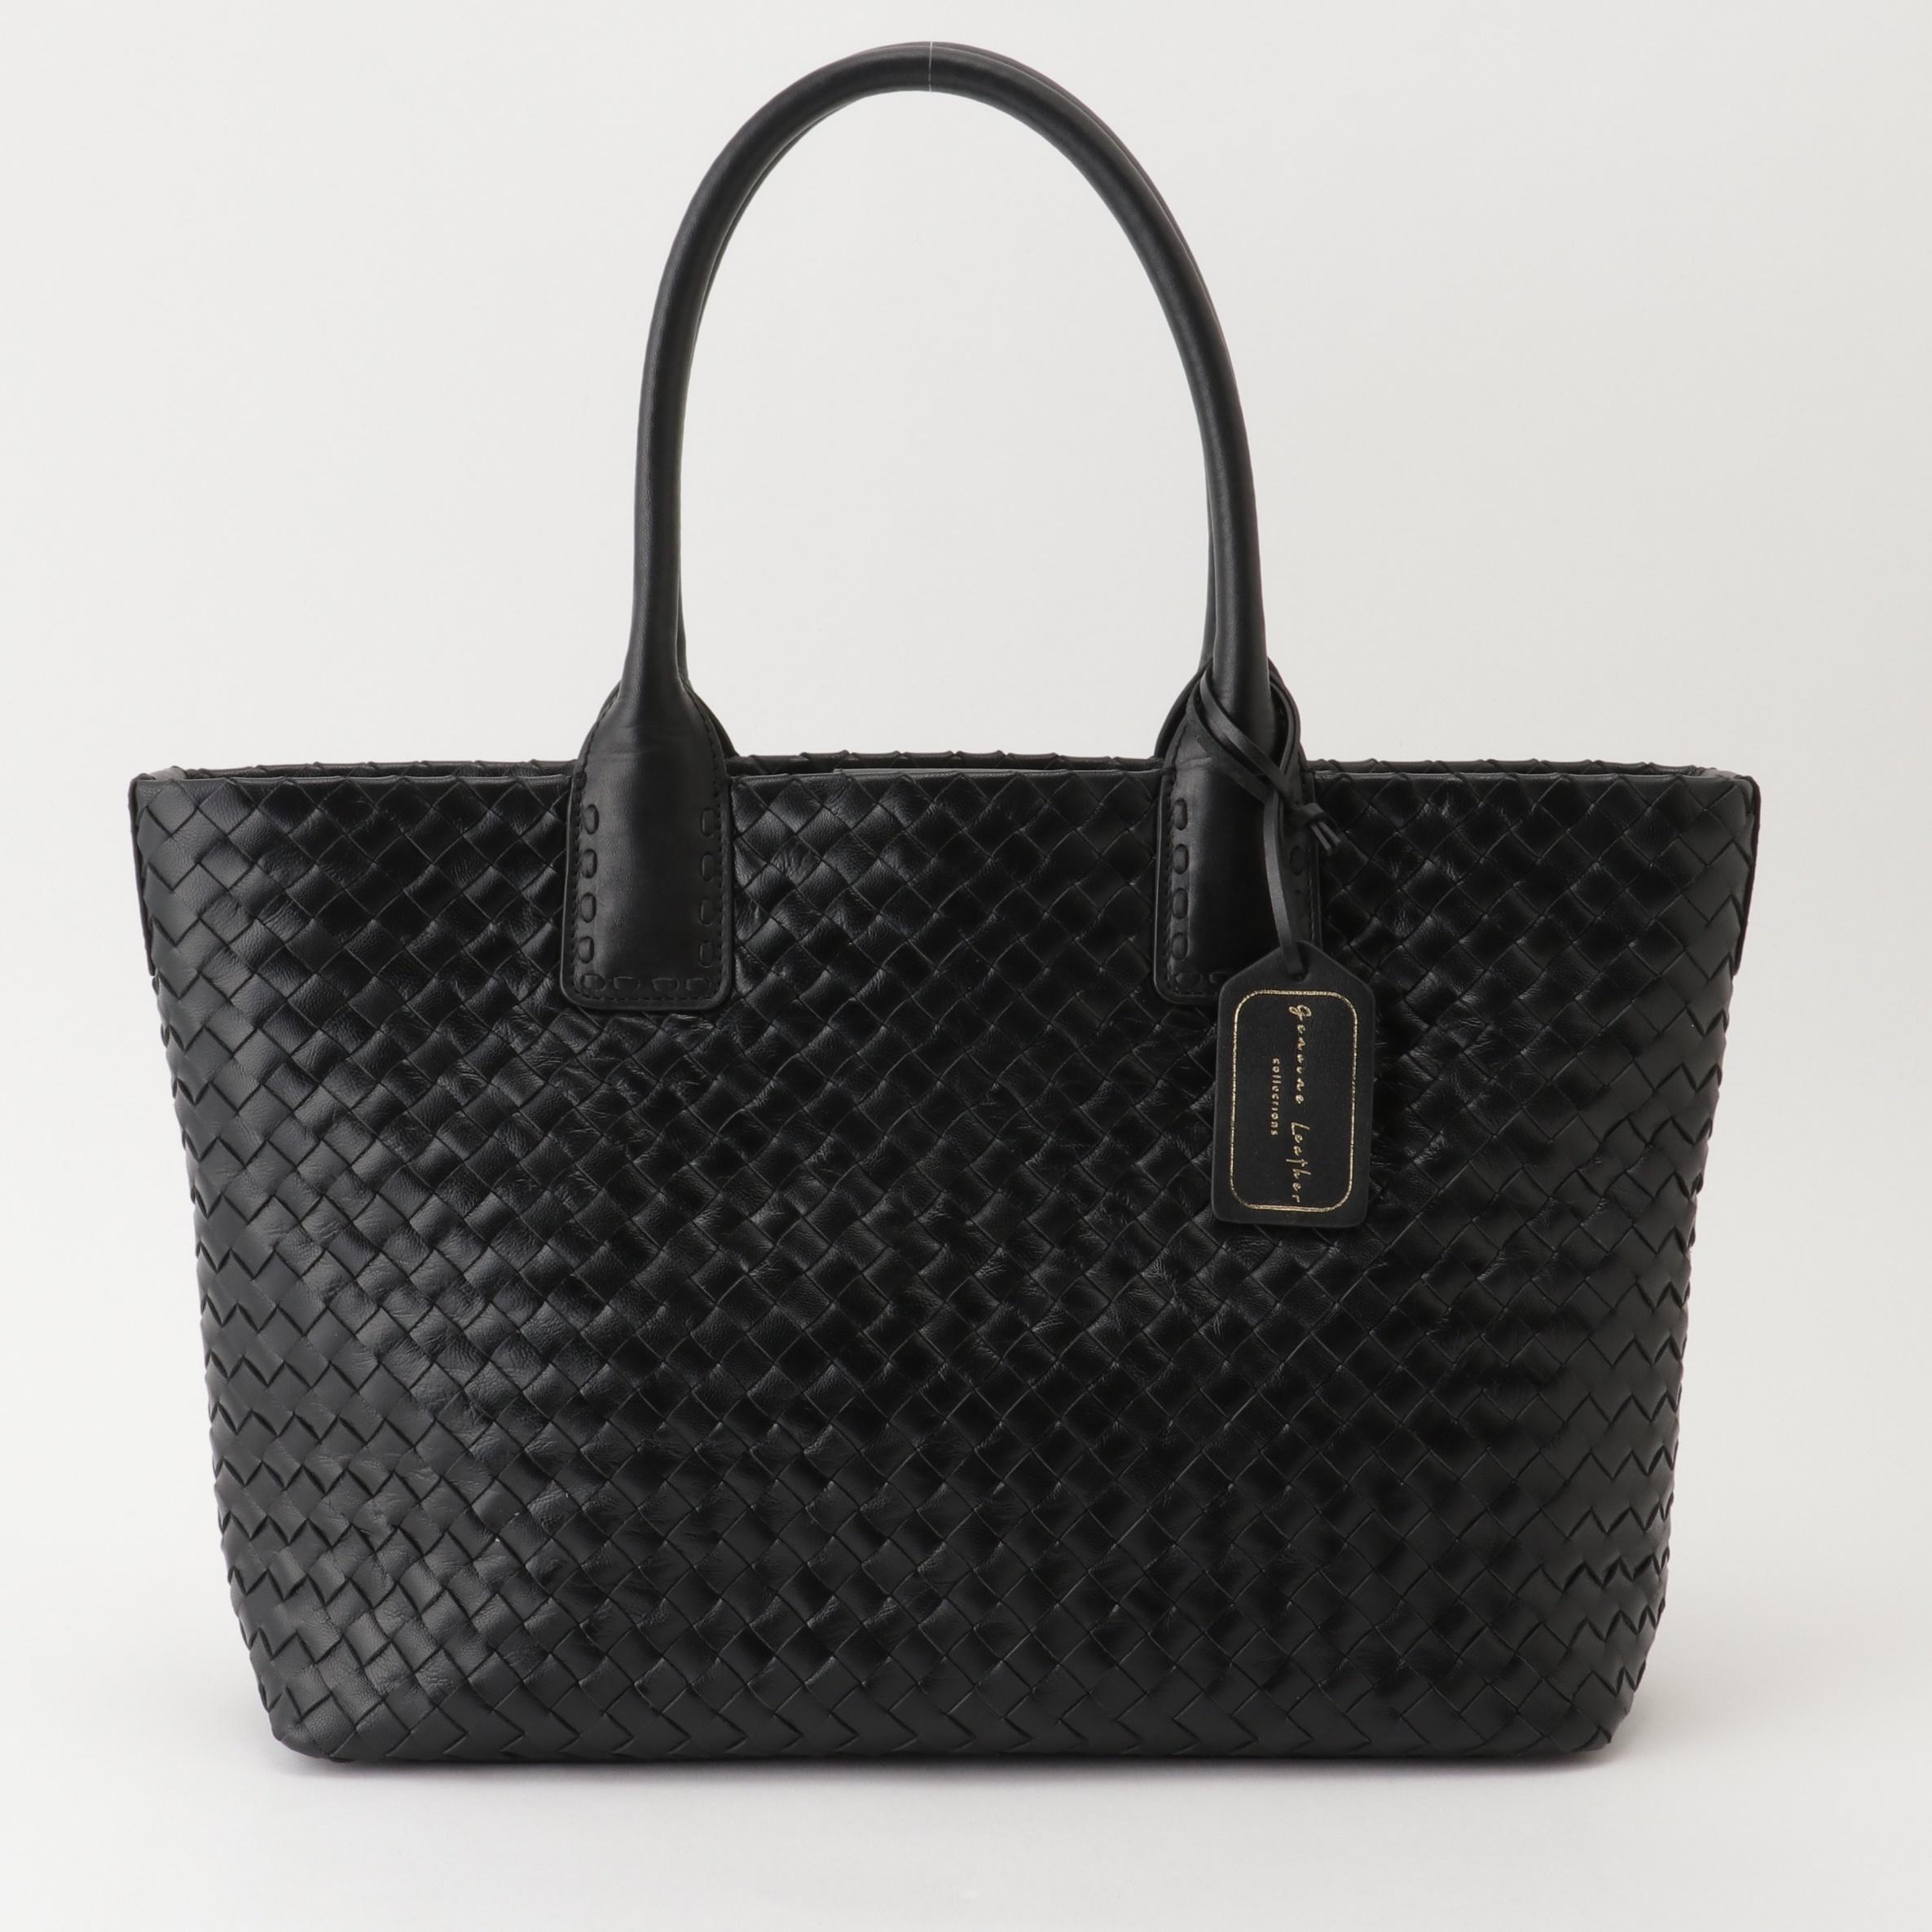 BLACK MESH TOTE~当店オリジナル革製品ブランド、Genuine Leather